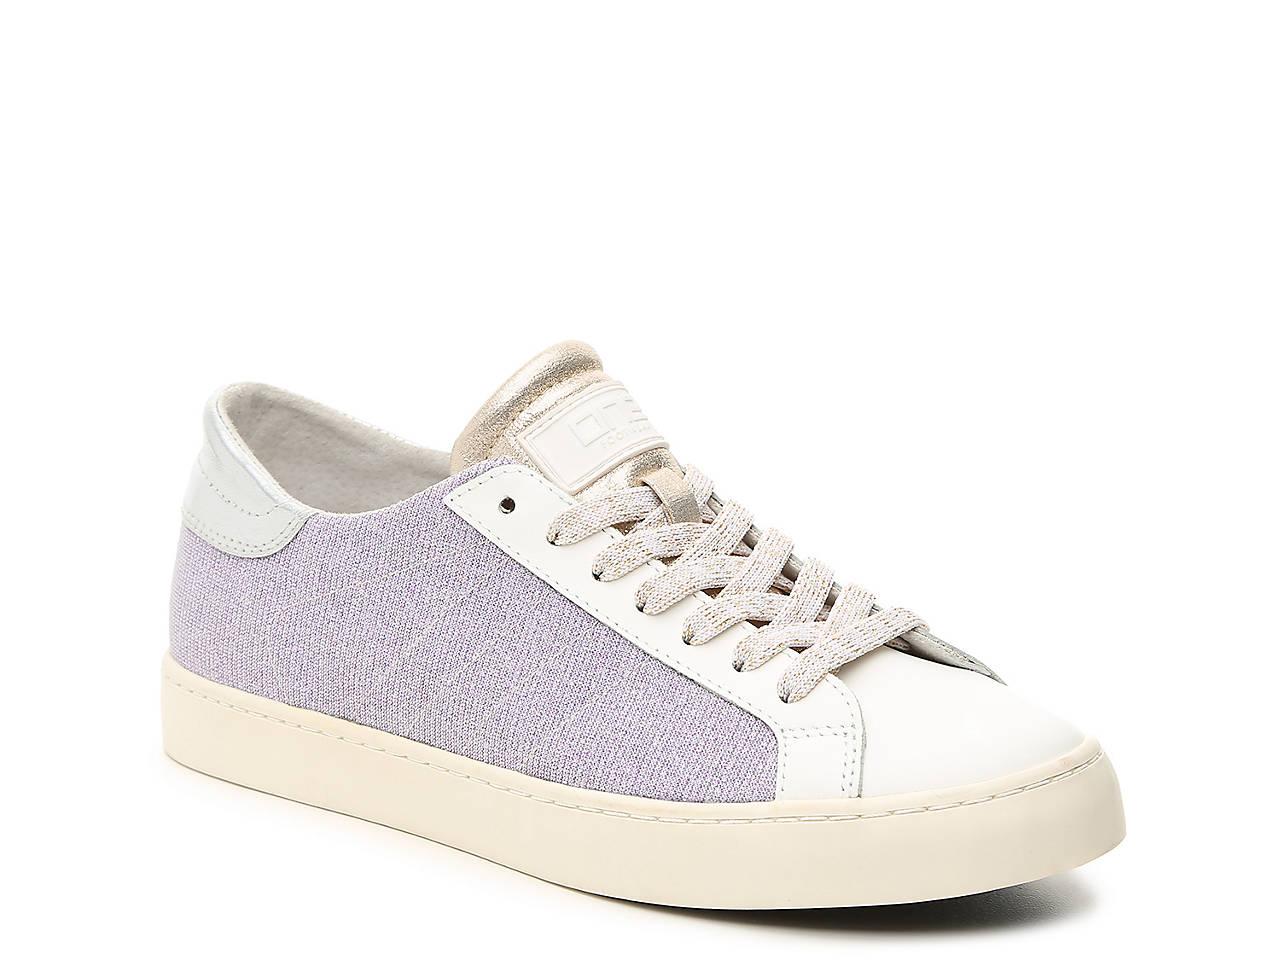 Sari Laminated Sneaker   Women's by One Footwear